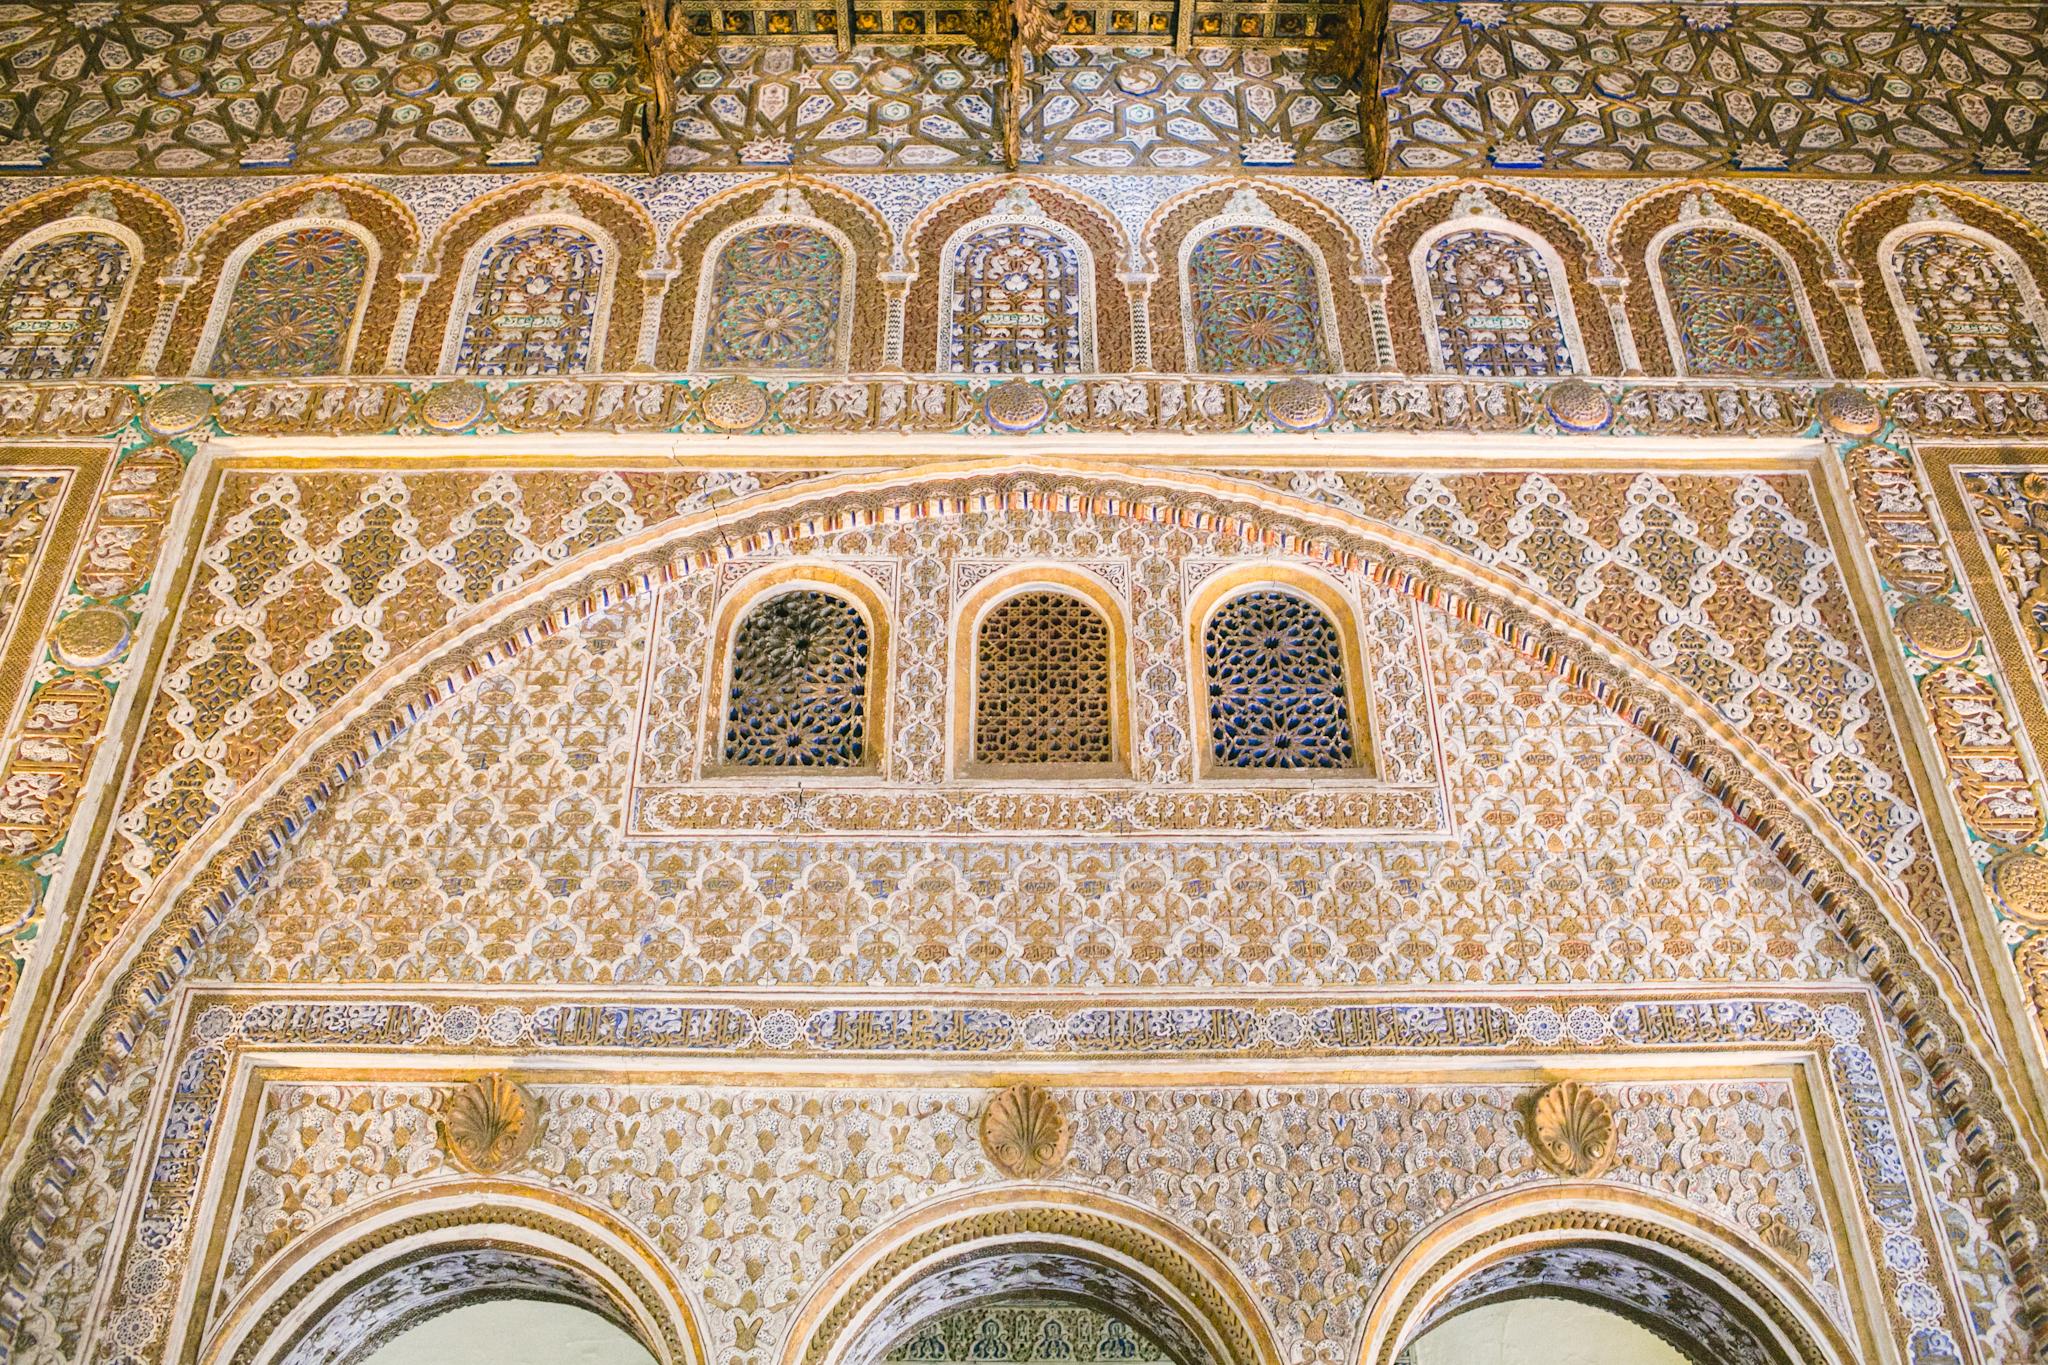 Interior of Real Alcazar palace